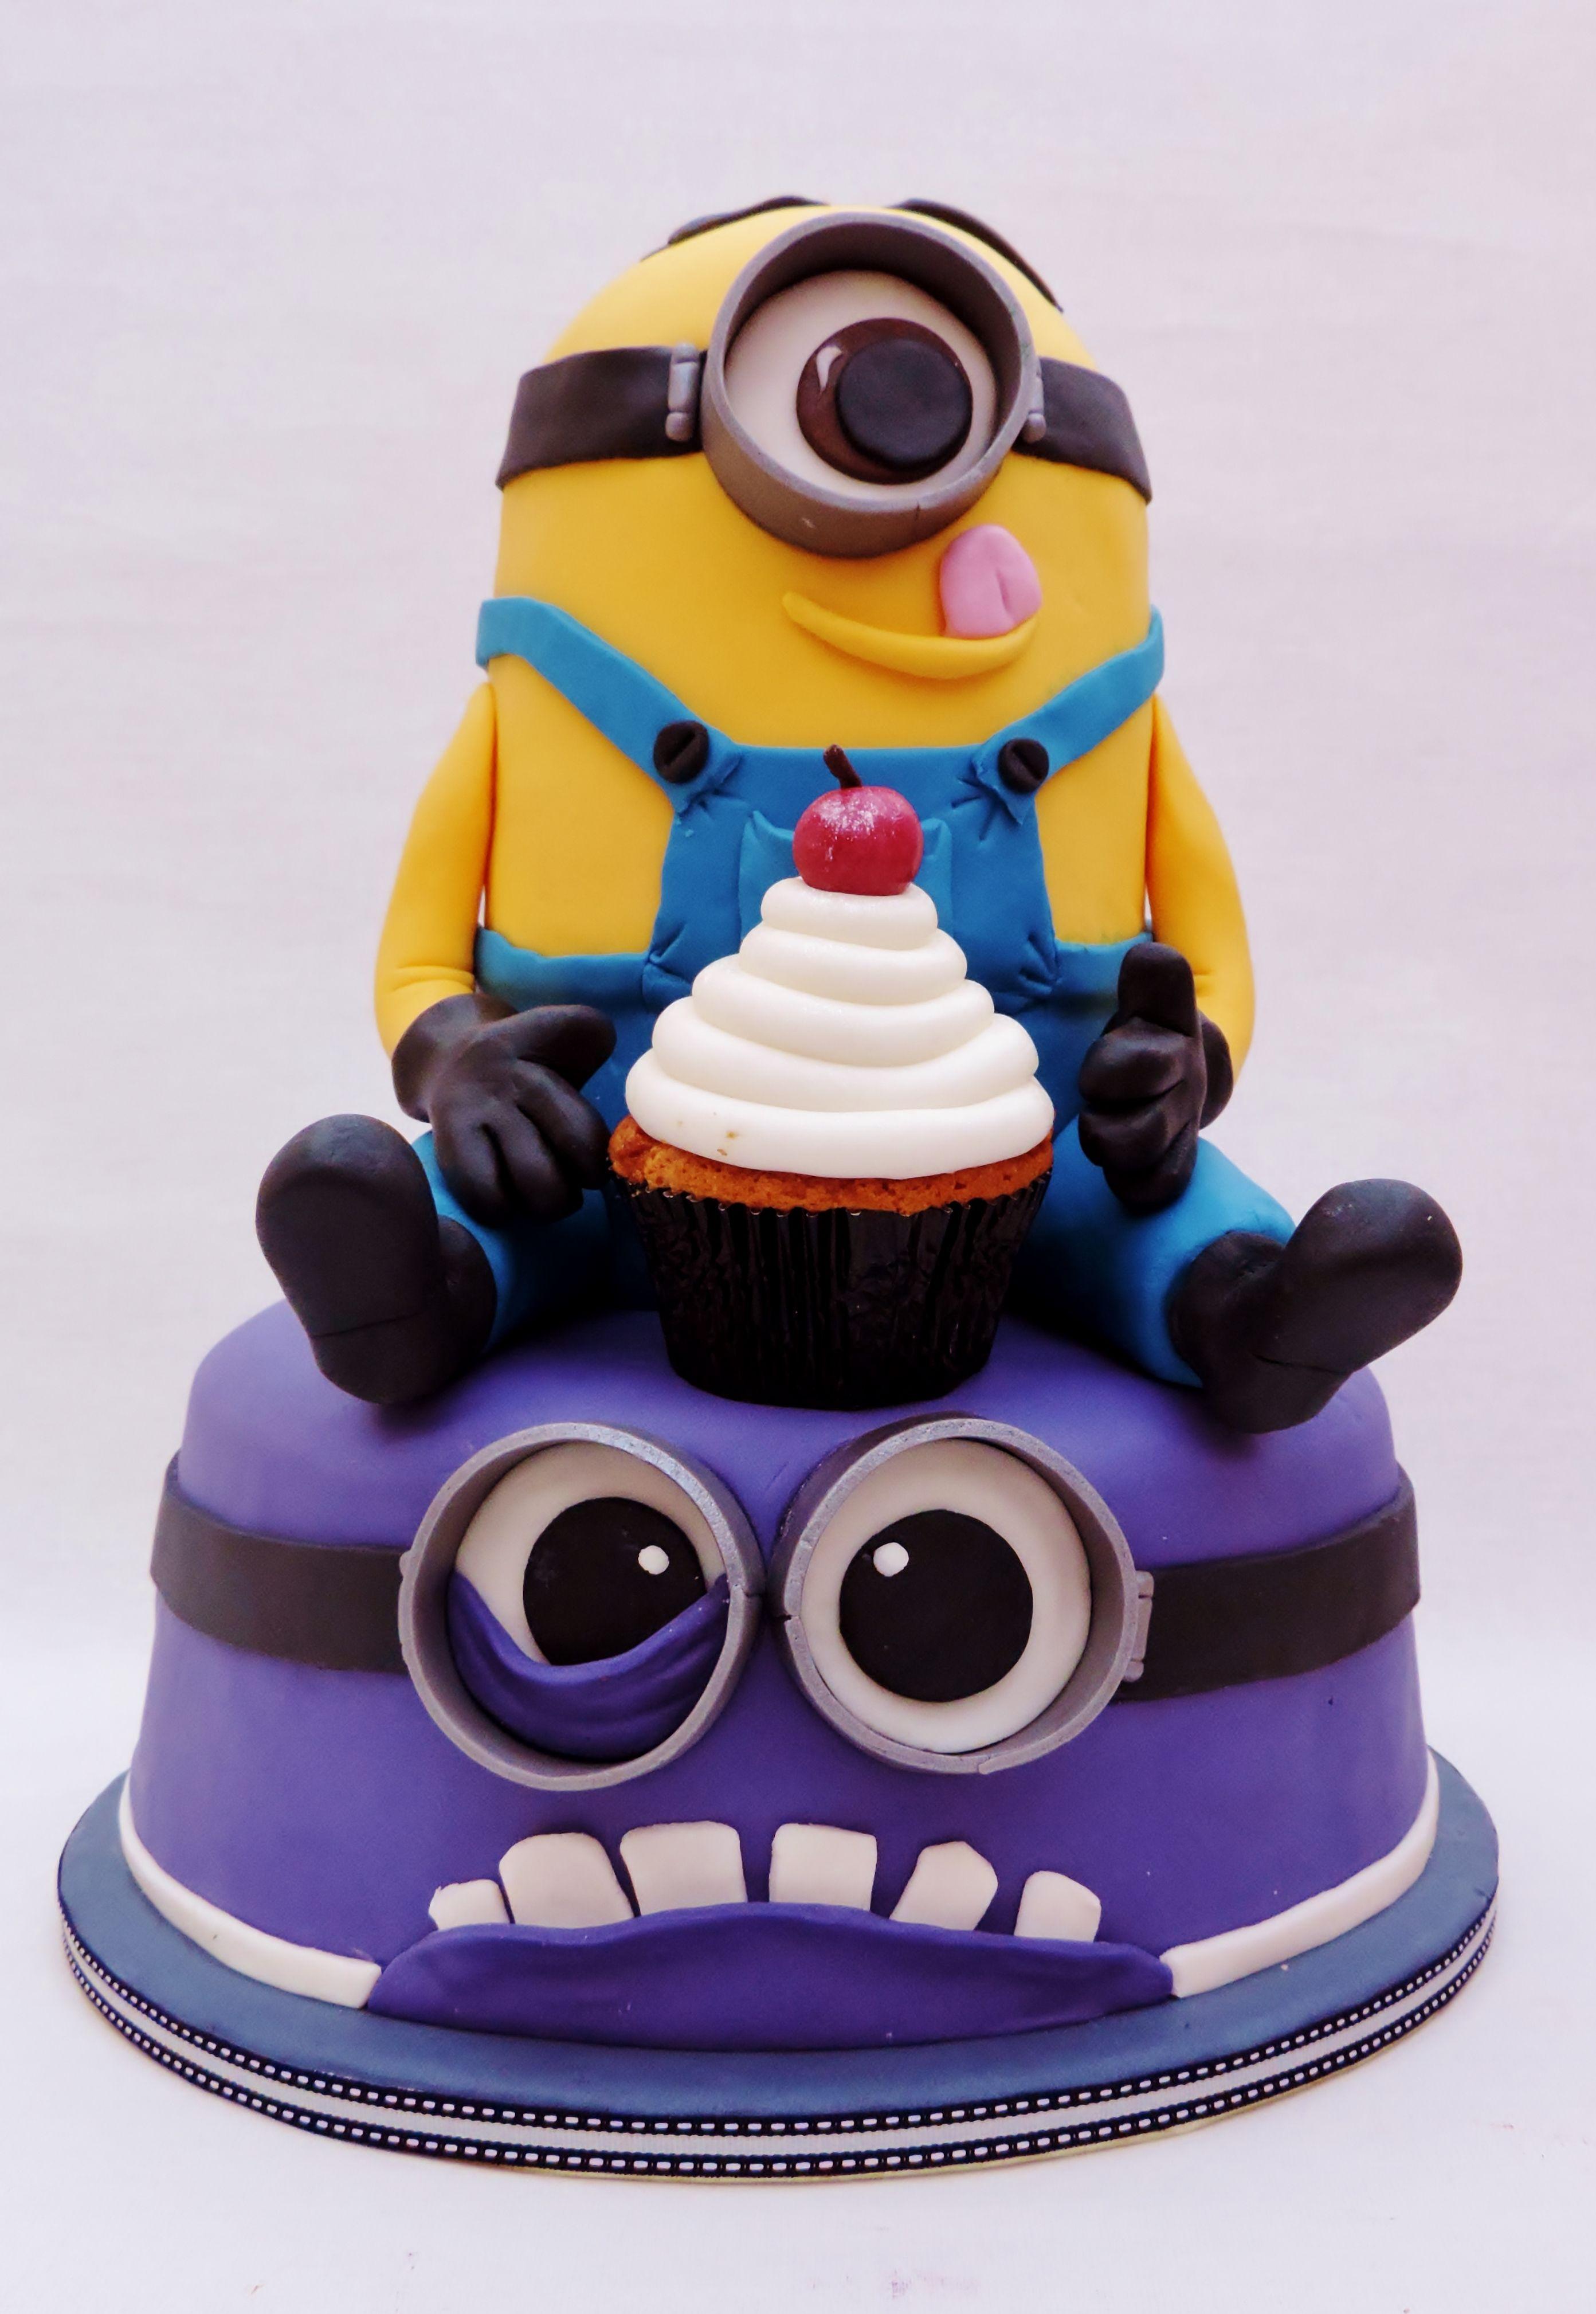 Minion Cake Design Pinterest : Pinterest Minion Cake Ideas 6397 Minion Cake Ideas Or The